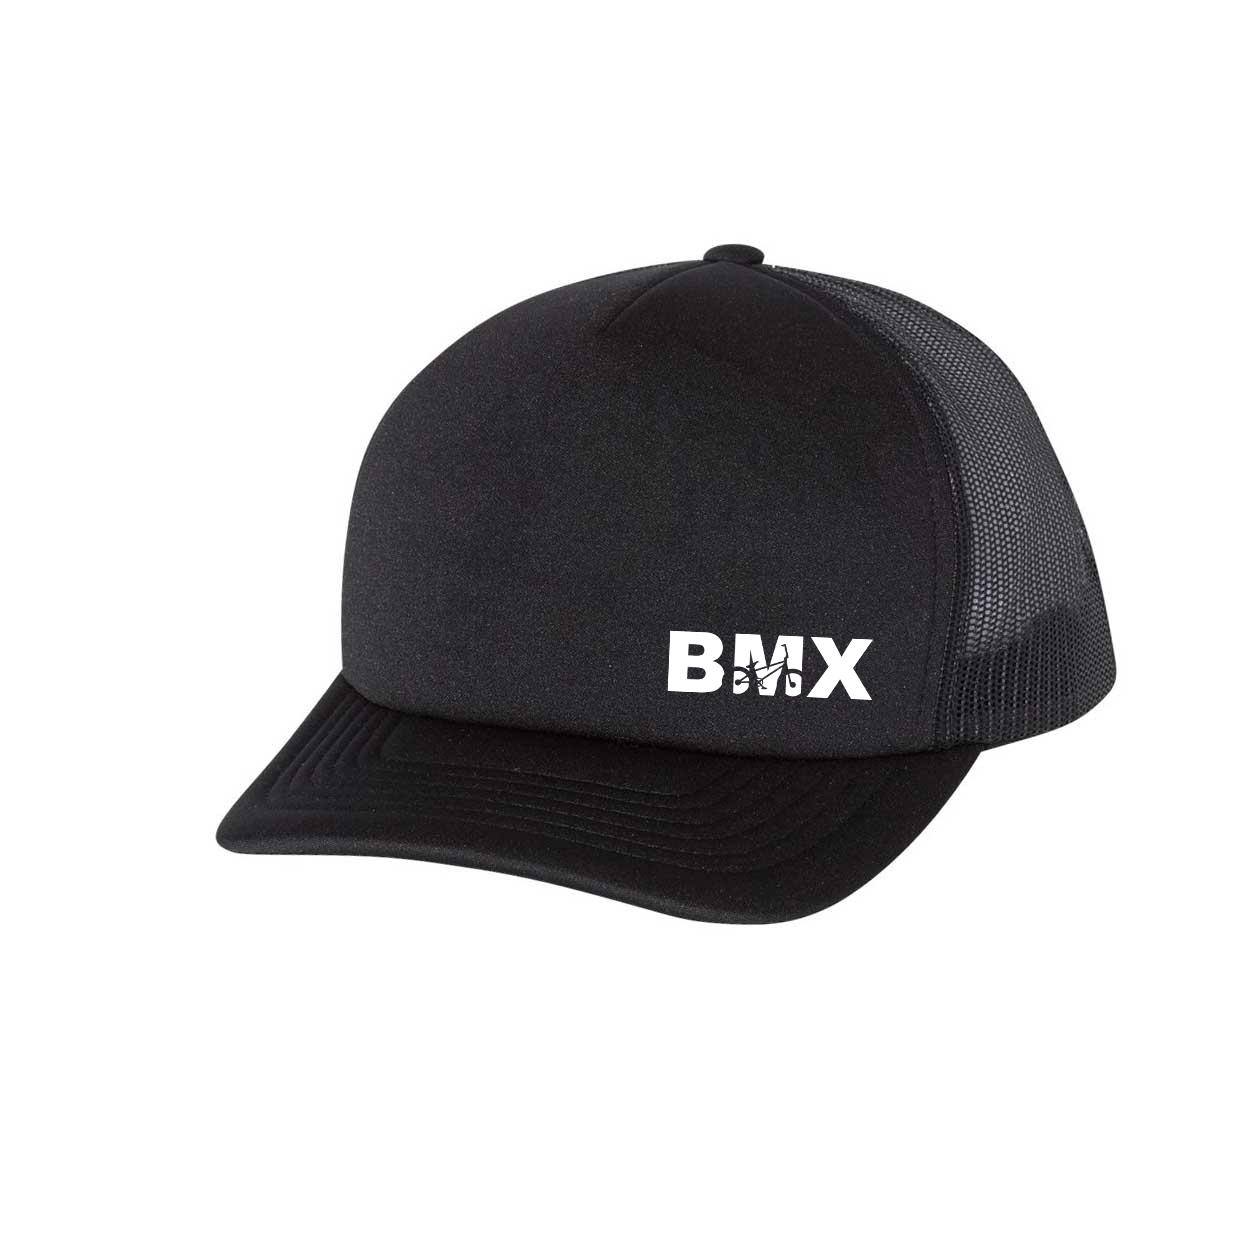 BMX Bike Logo Night Out Premium Foam Trucker Snapback Hat Black (White Logo)